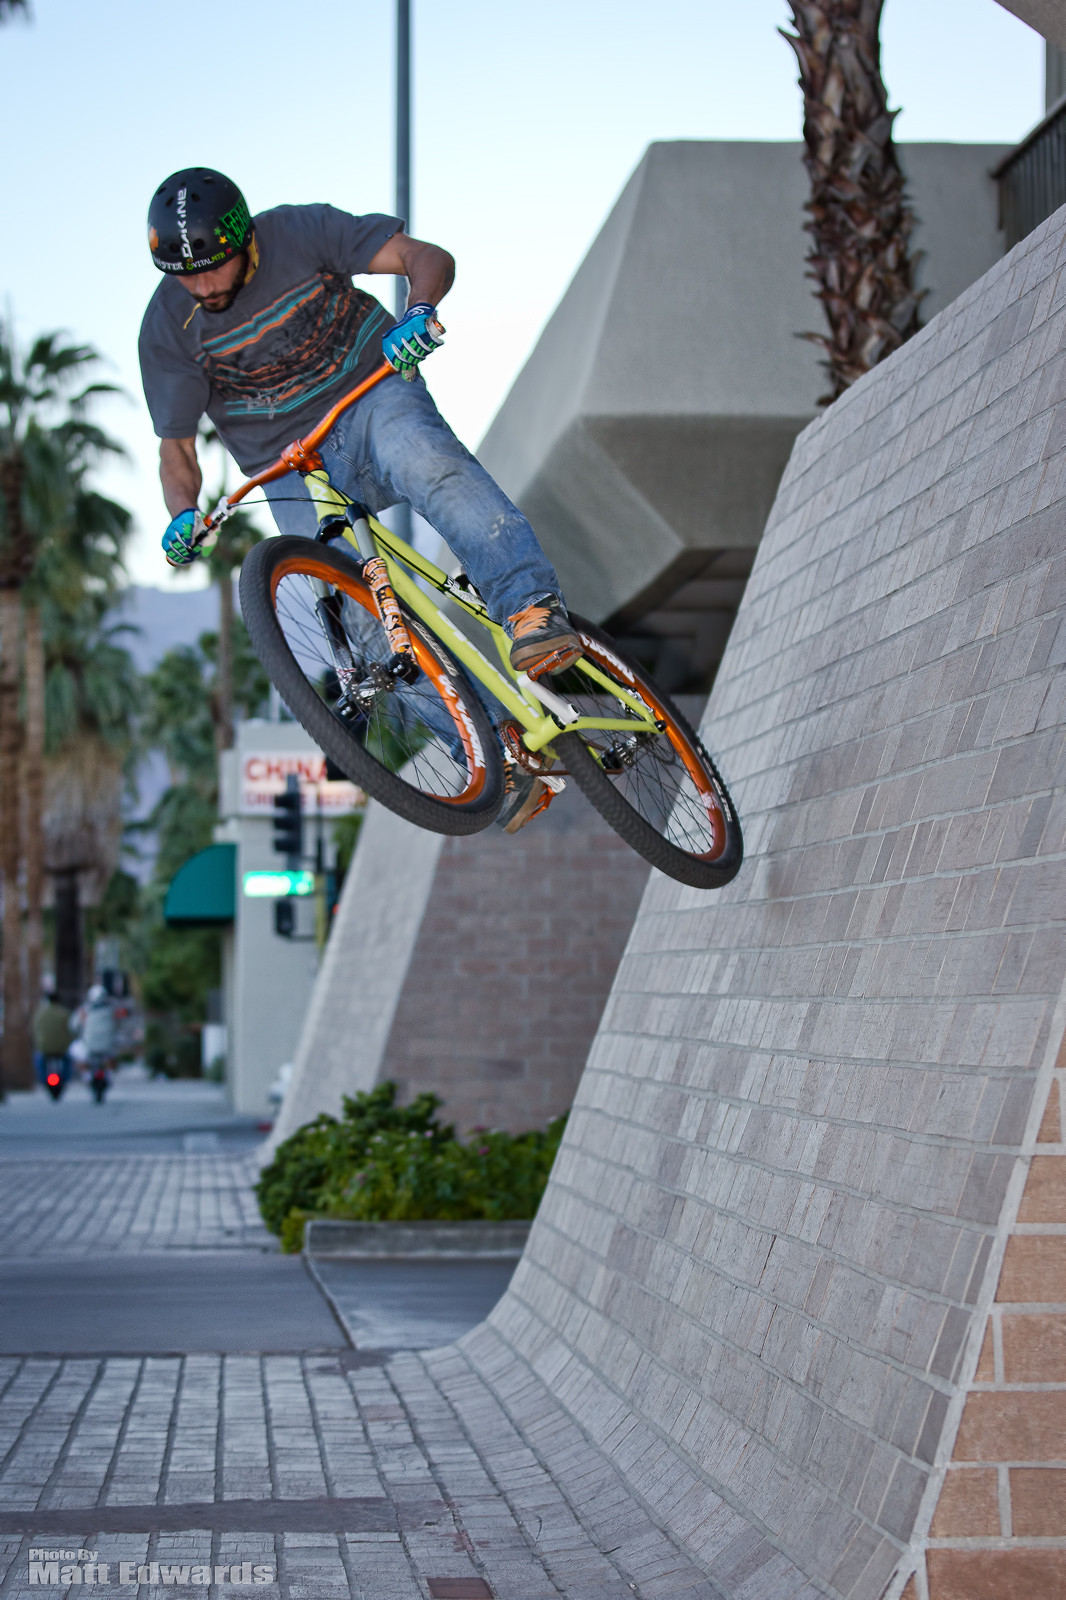 Palm Spring Wall Ride - EdwardsEntertainment - Mountain Biking Pictures - Vital MTB